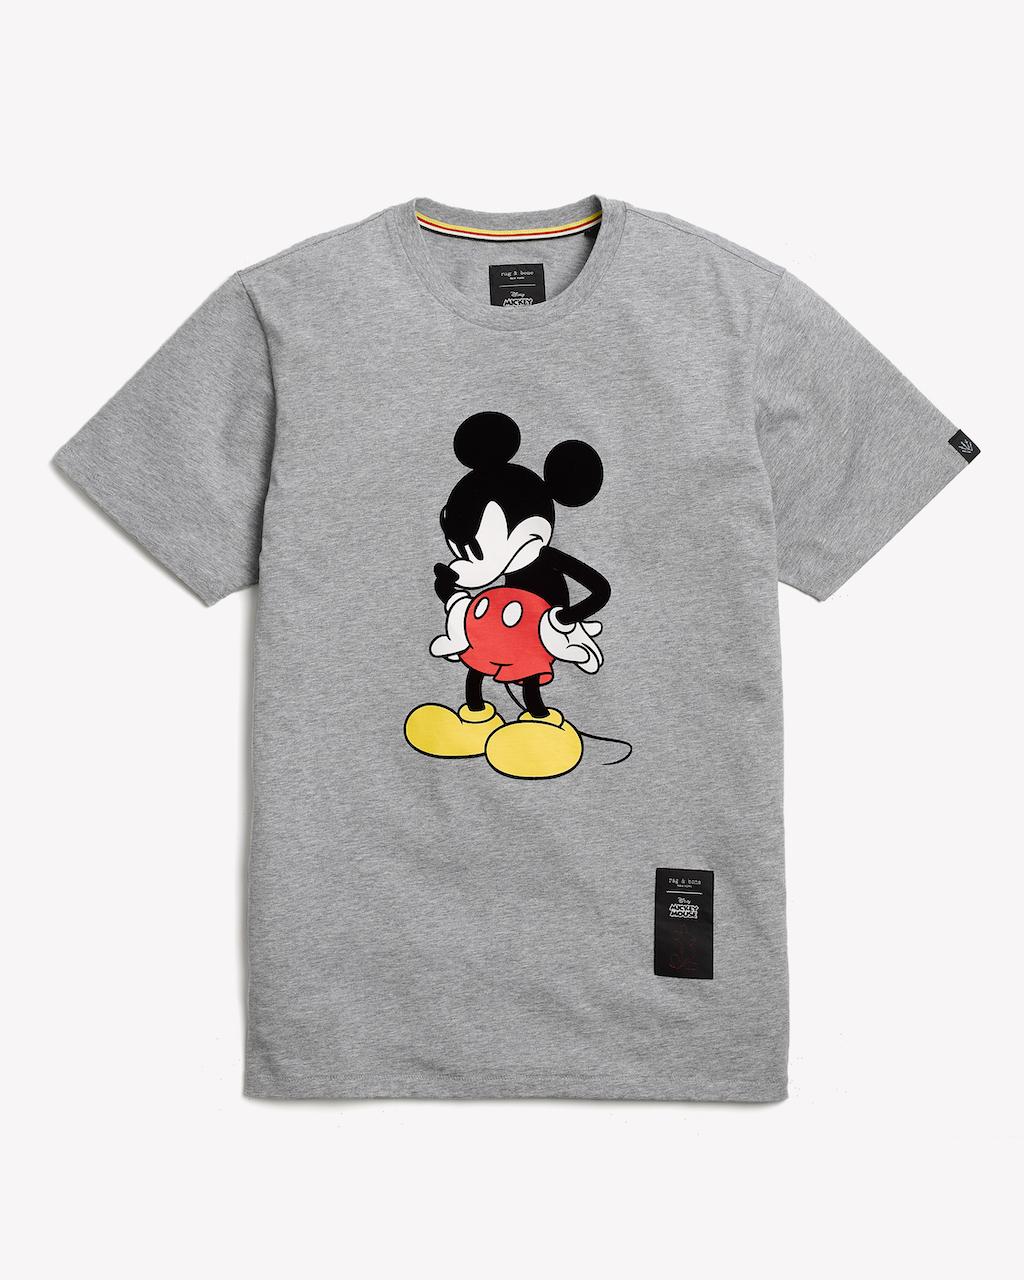 Rag Amp Bone X Disney Mickey Mouse Collection